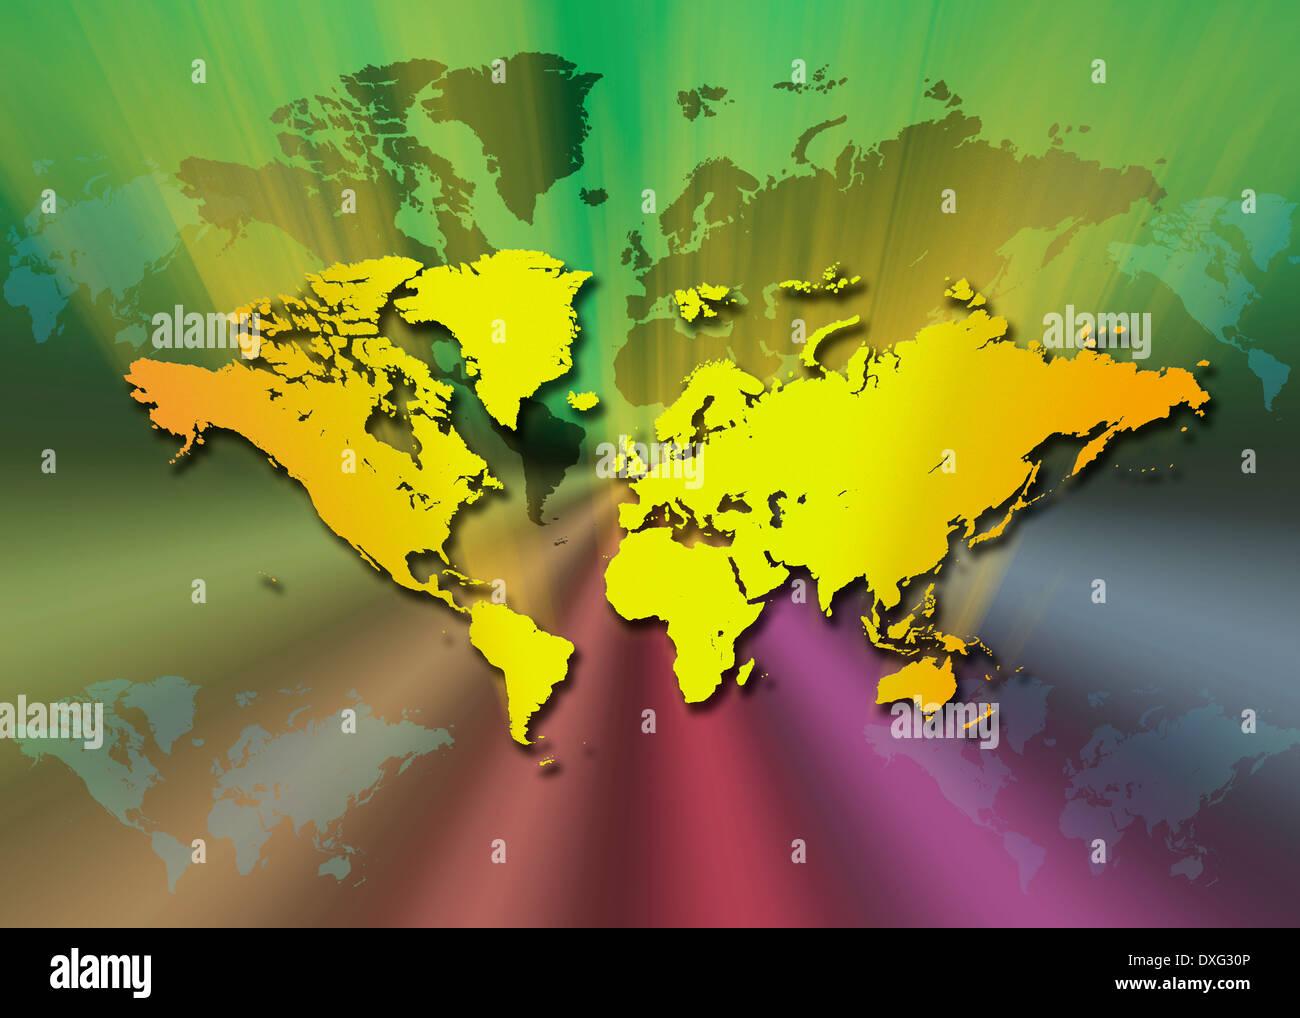 Karte Der Welt Stockfoto Bild 67965766 Alamy